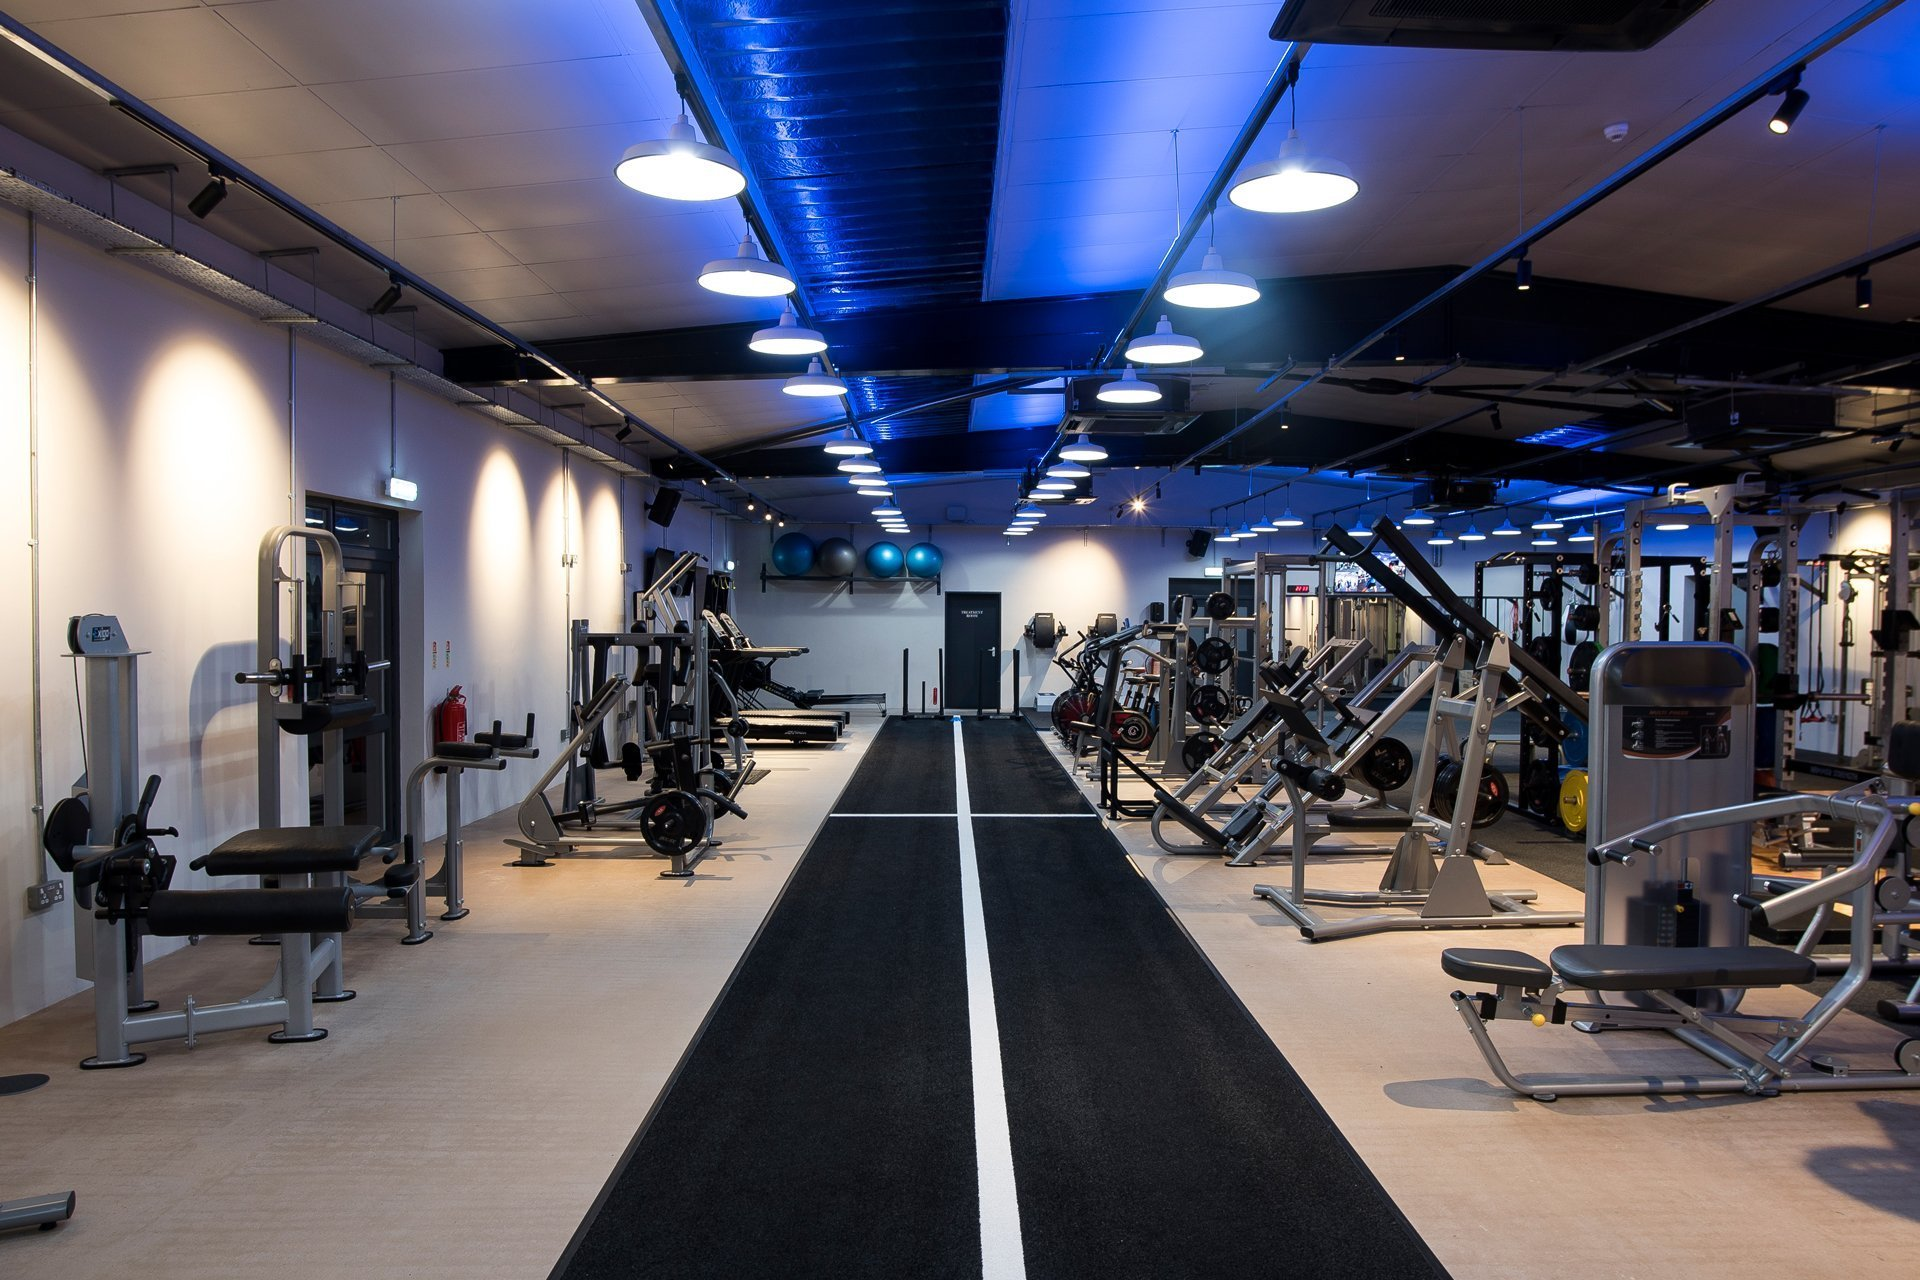 Equilibrium Gym & Fitness 20m Prowler Lane